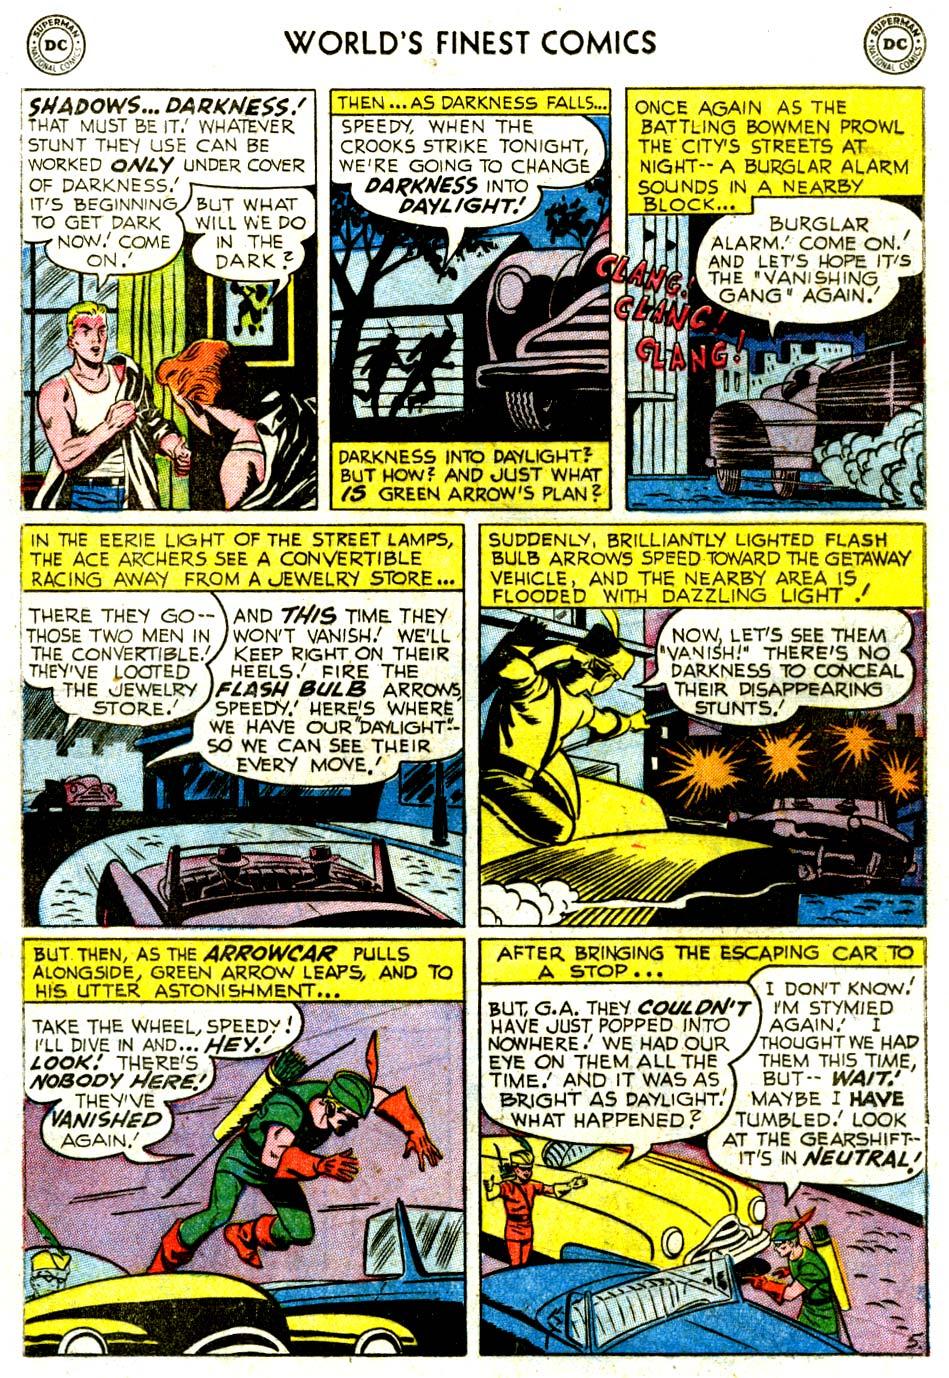 Read online World's Finest Comics comic -  Issue #68 - 31